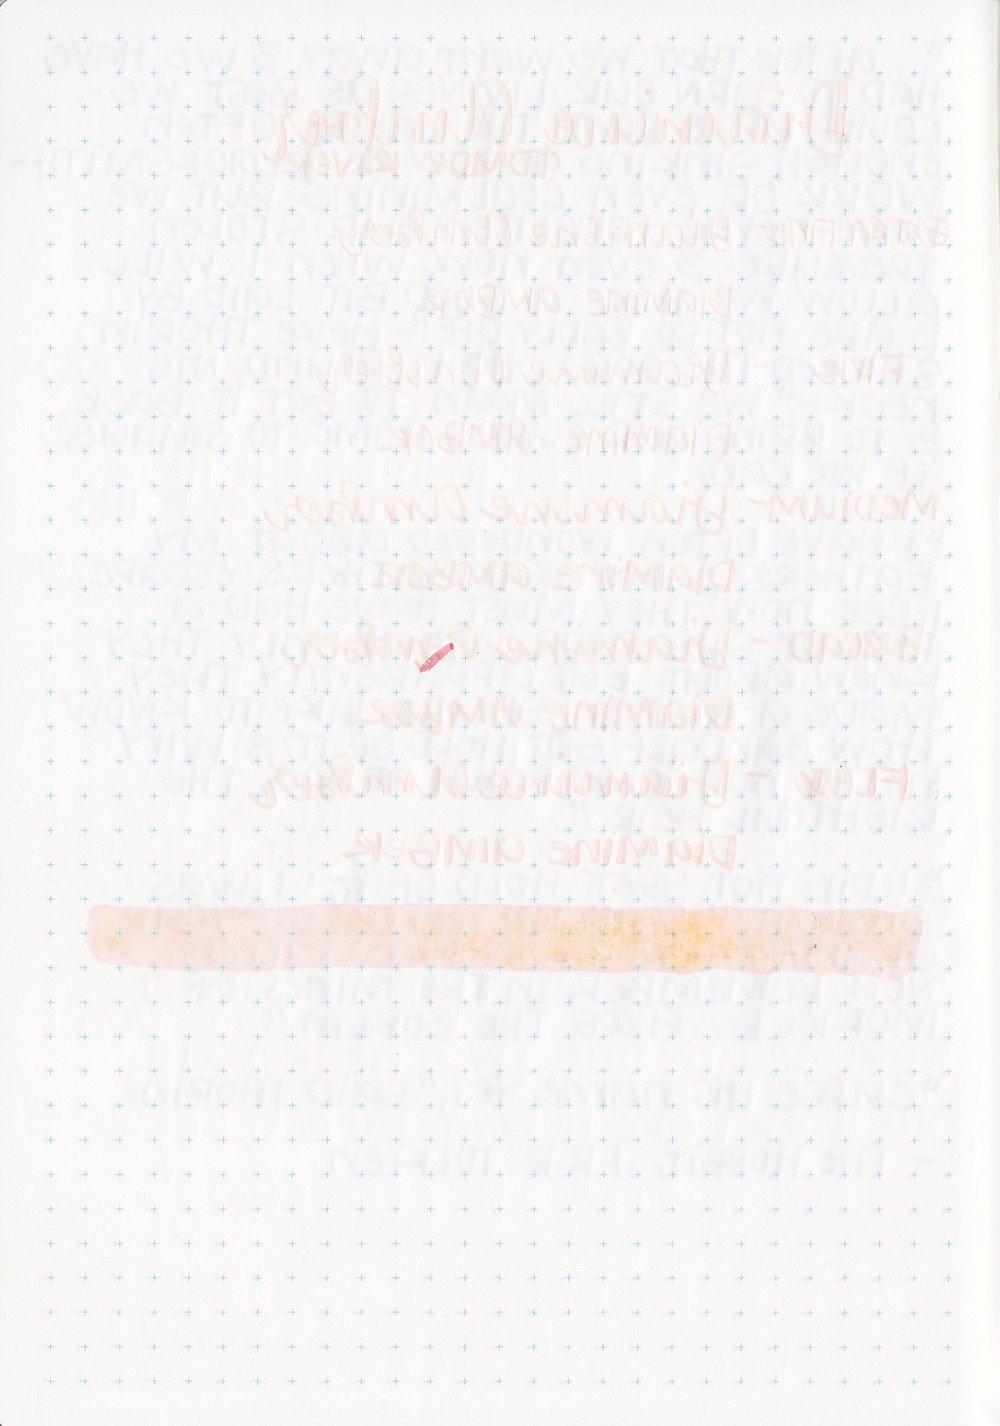 DAmber - 8.jpg